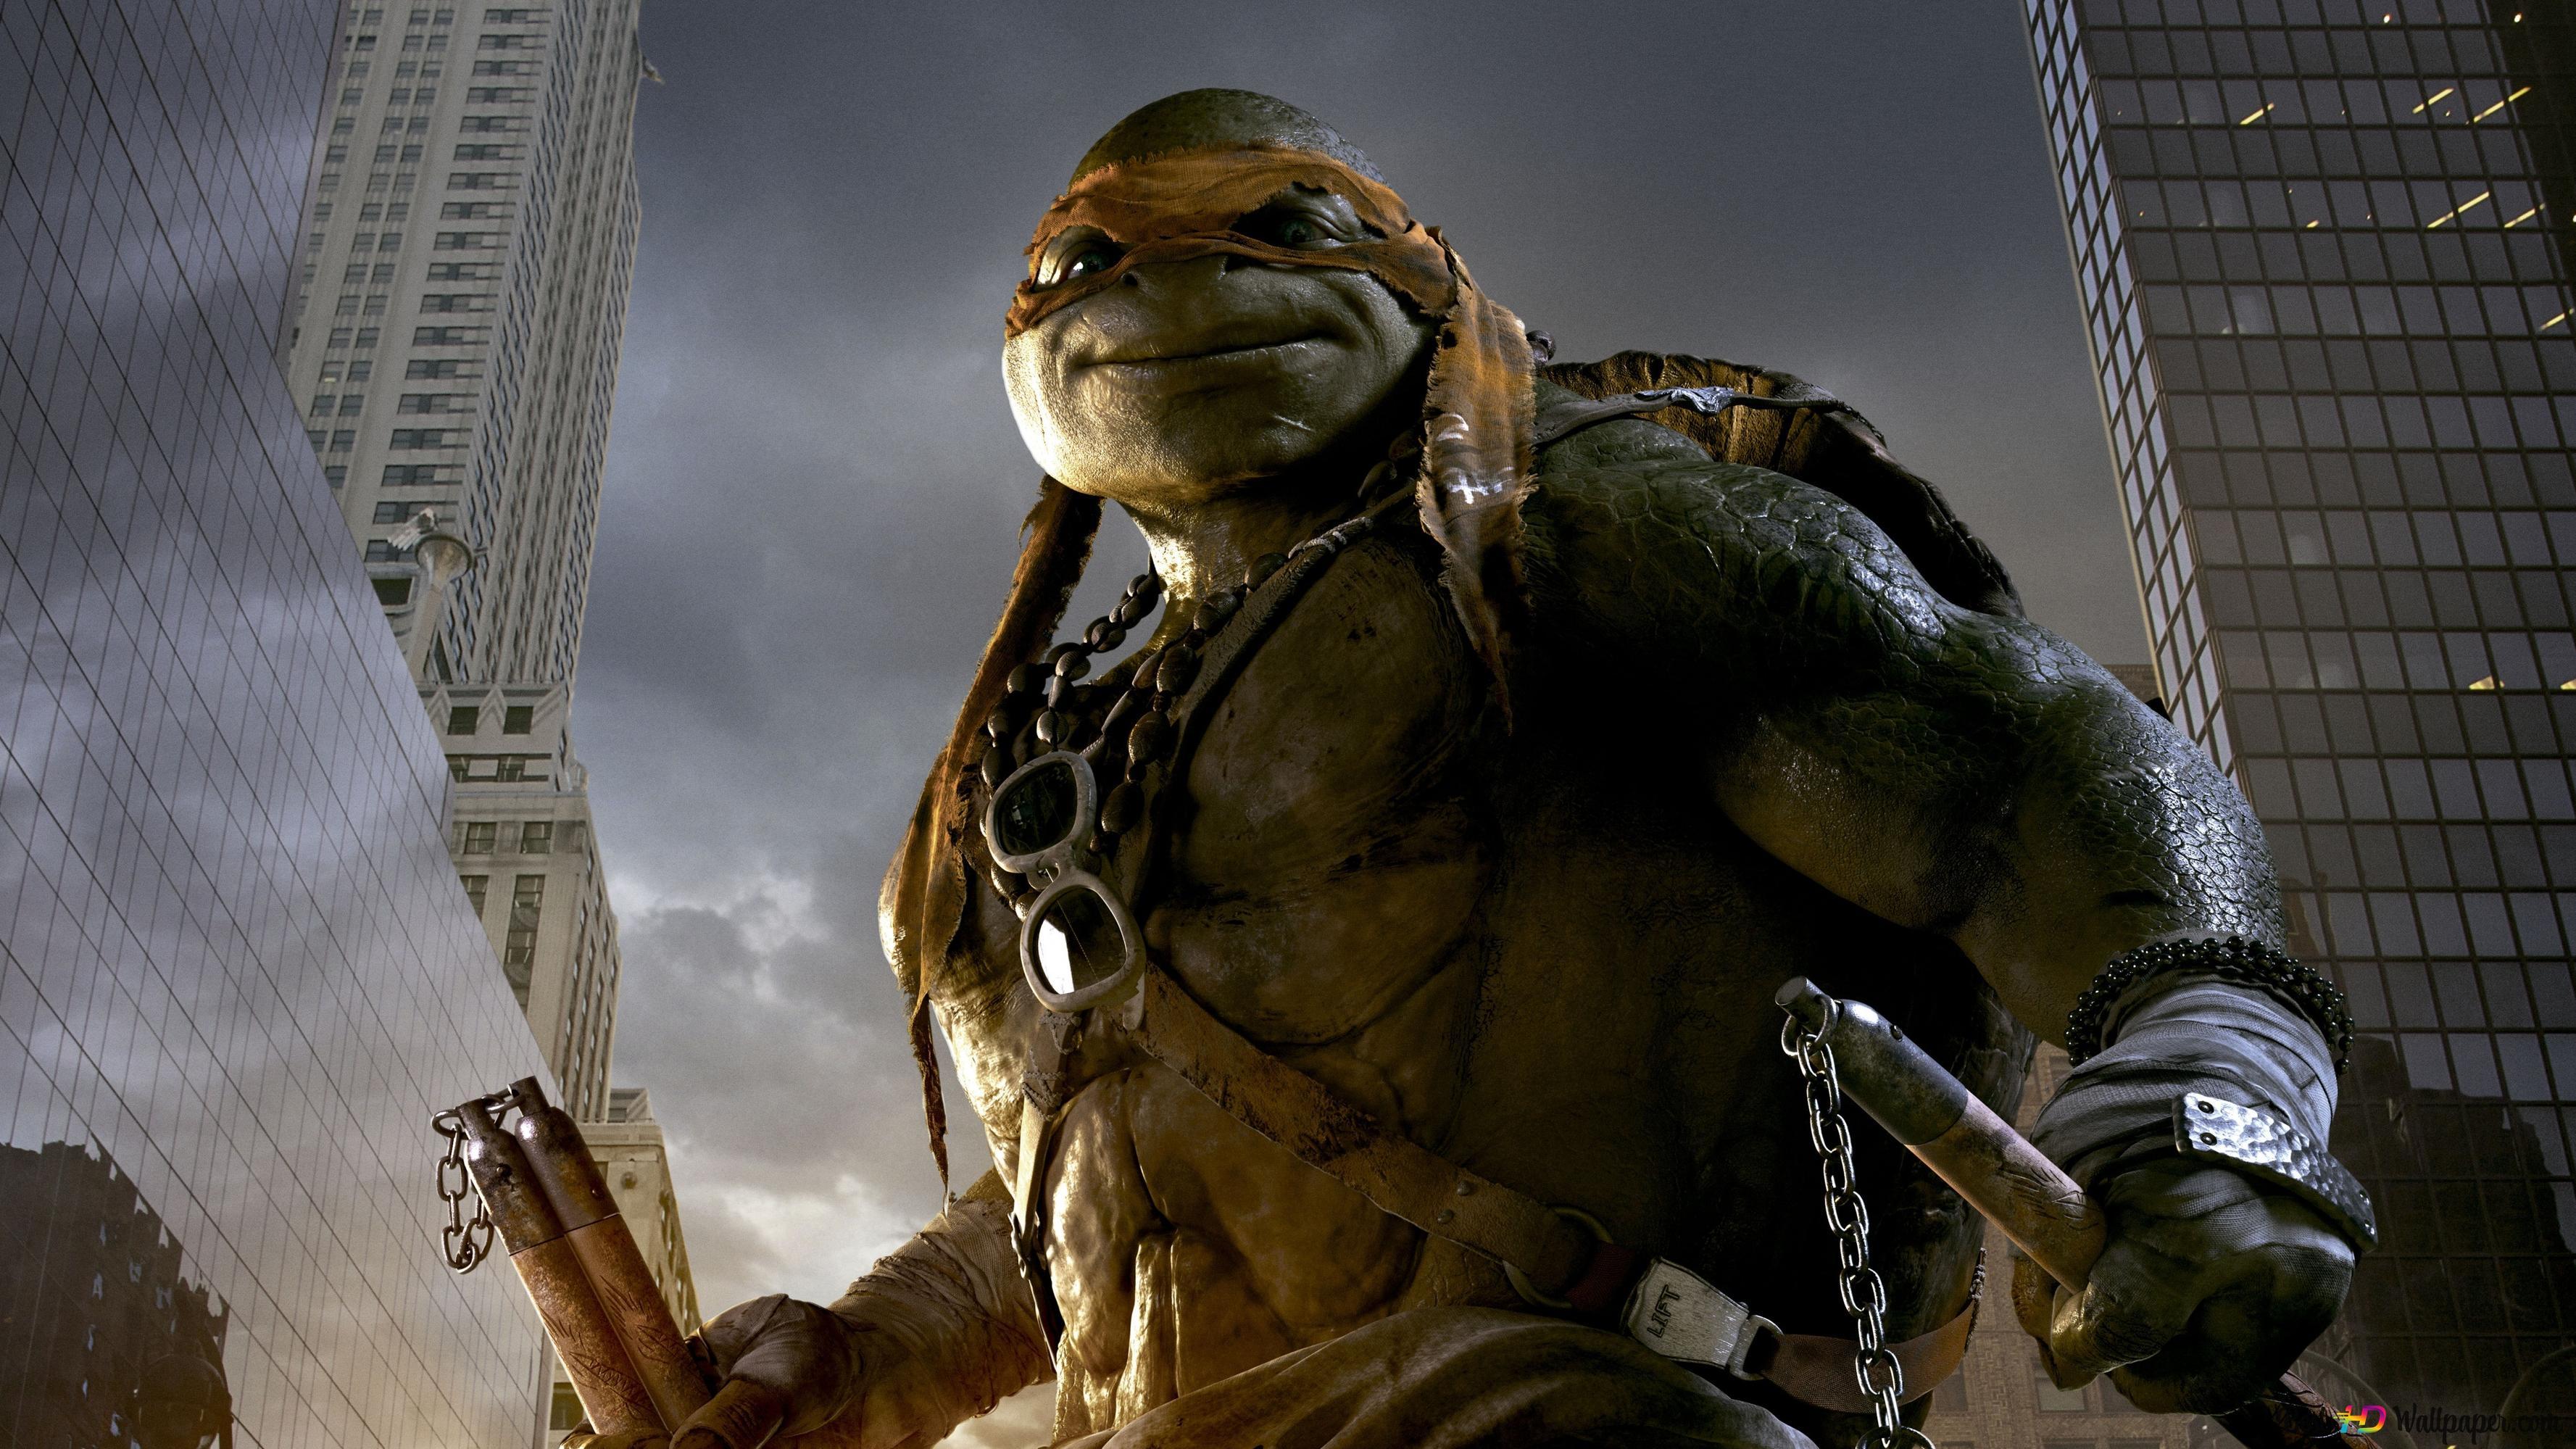 Teenage Mutant Ninja Turtles Michelangelo Hd Wallpaper Download